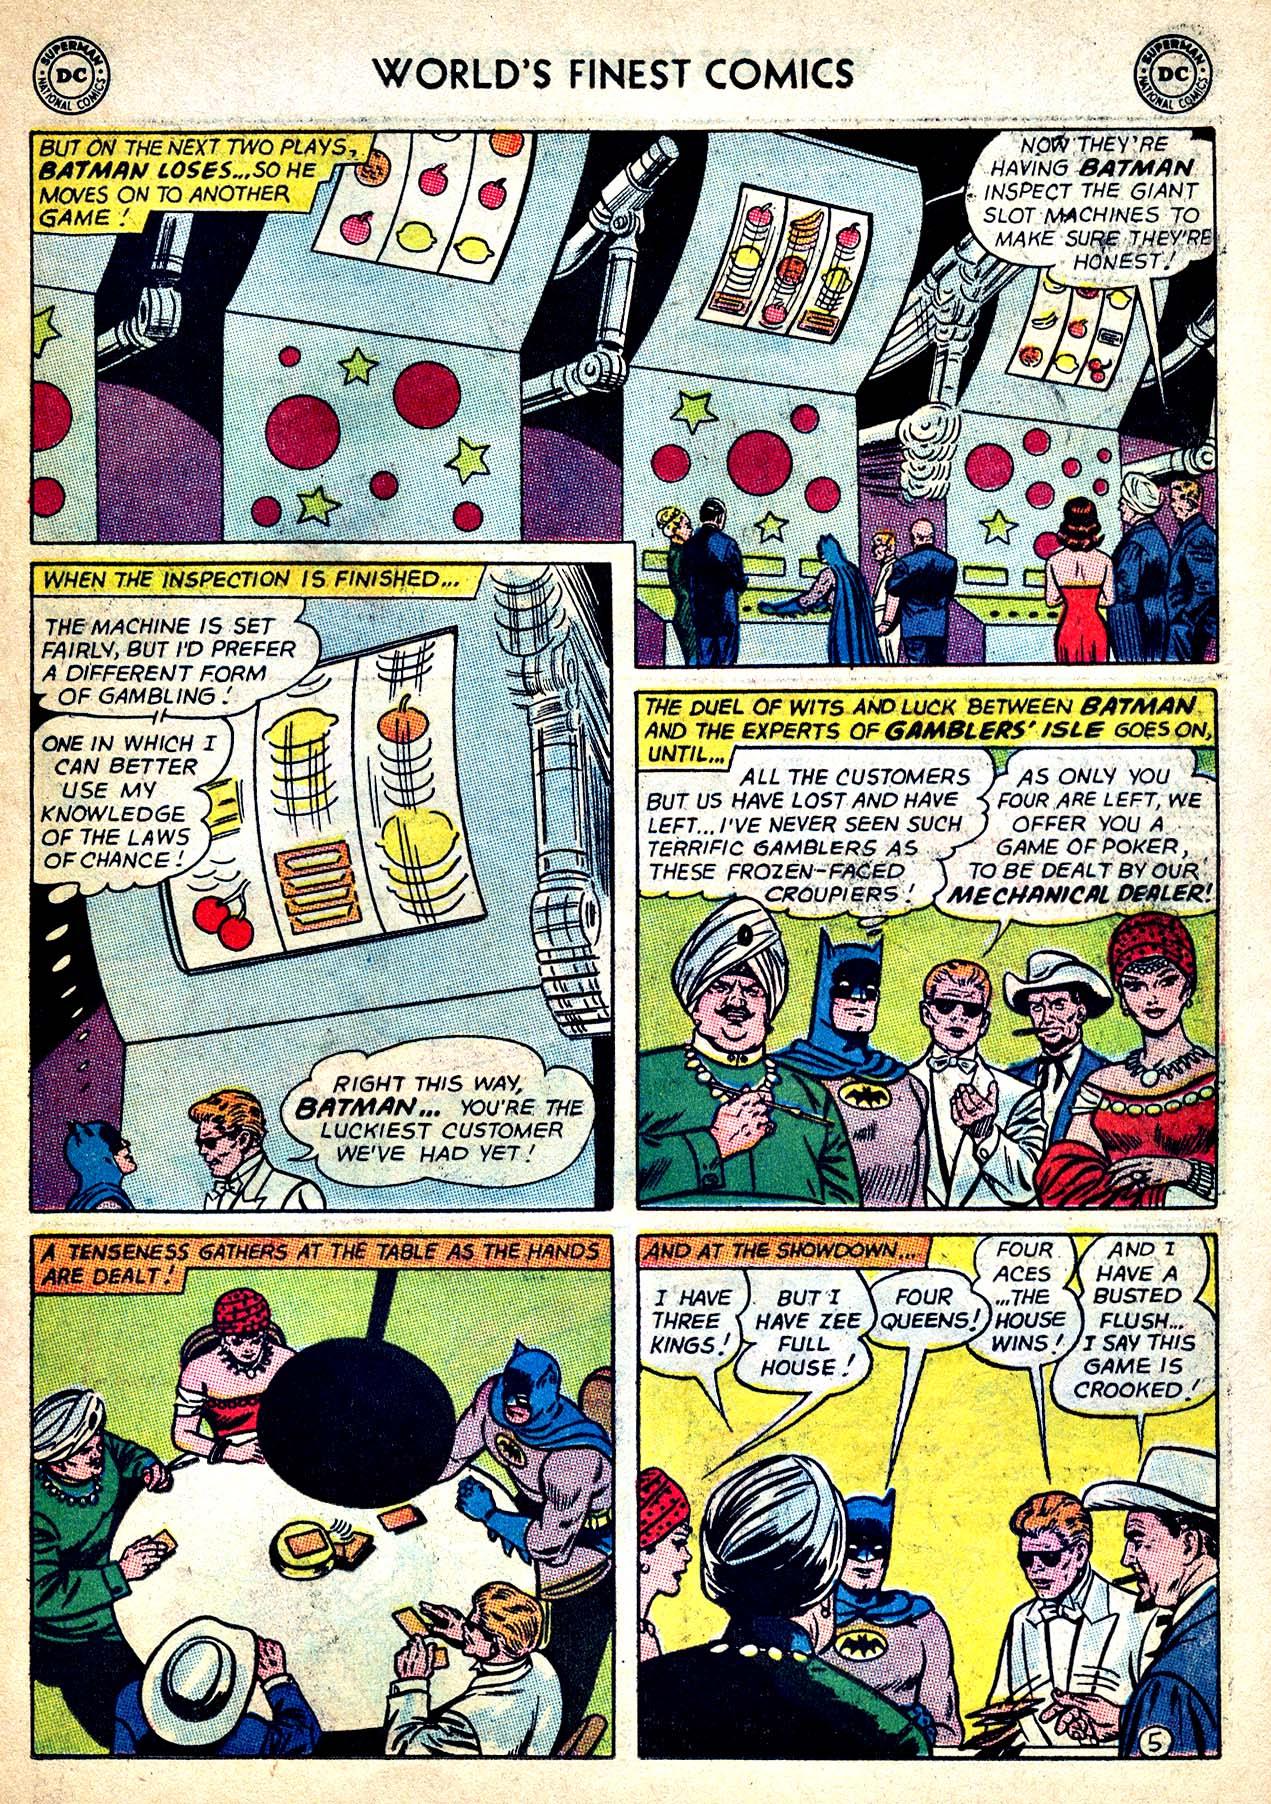 Read online World's Finest Comics comic -  Issue #150 - 7